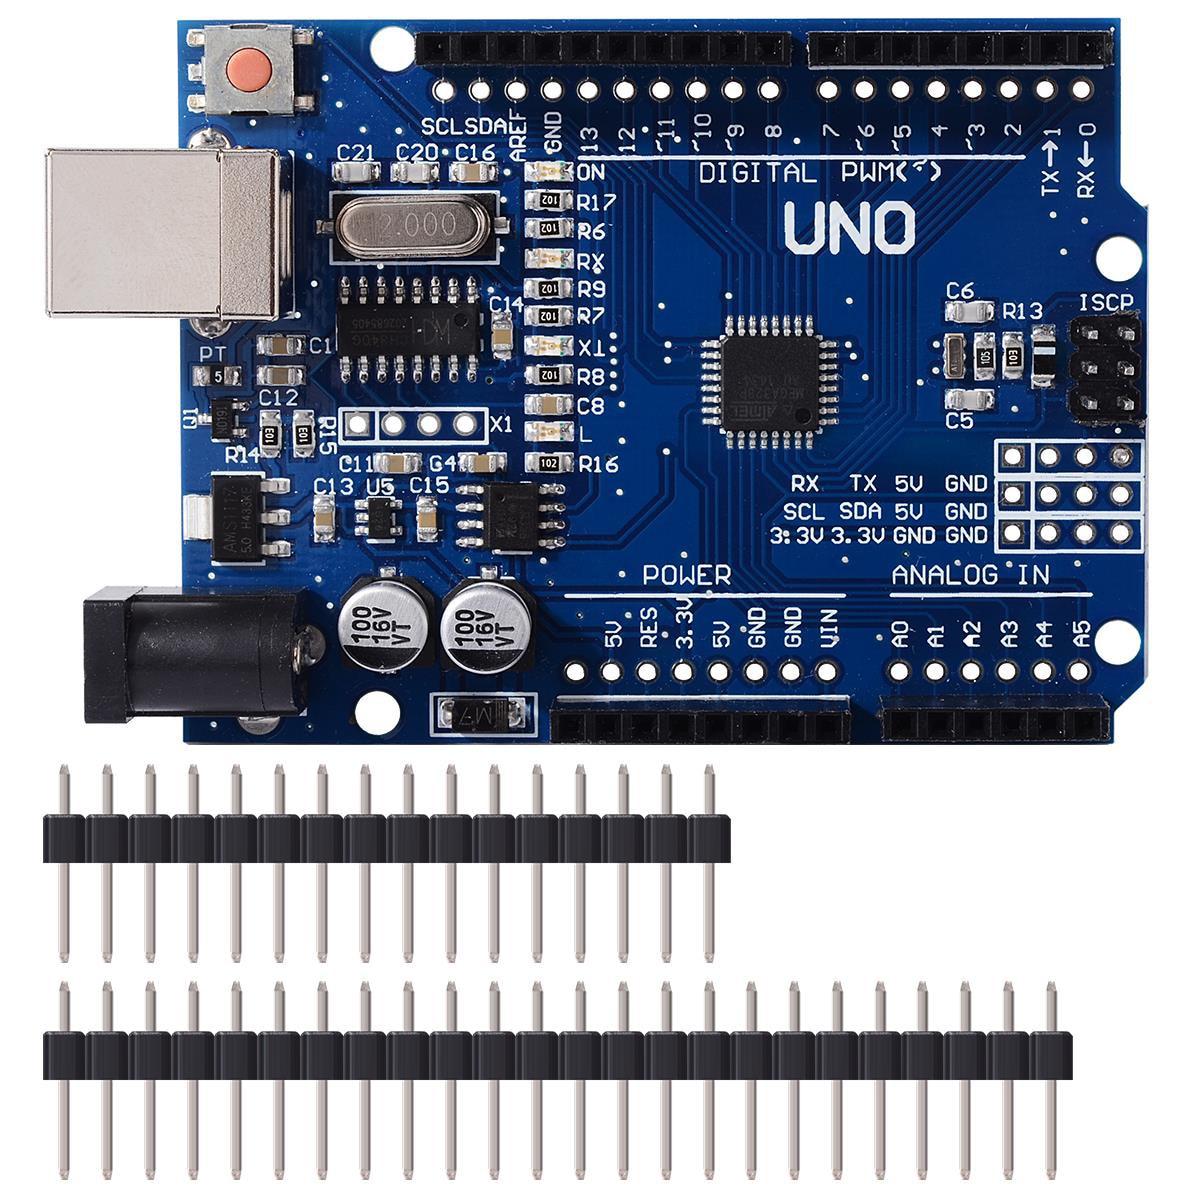 uno-r3-development-board-atmega328p-ch340-ch340g-for-font-b-arduino-b-font-uno-r3-with-straight-pin-header